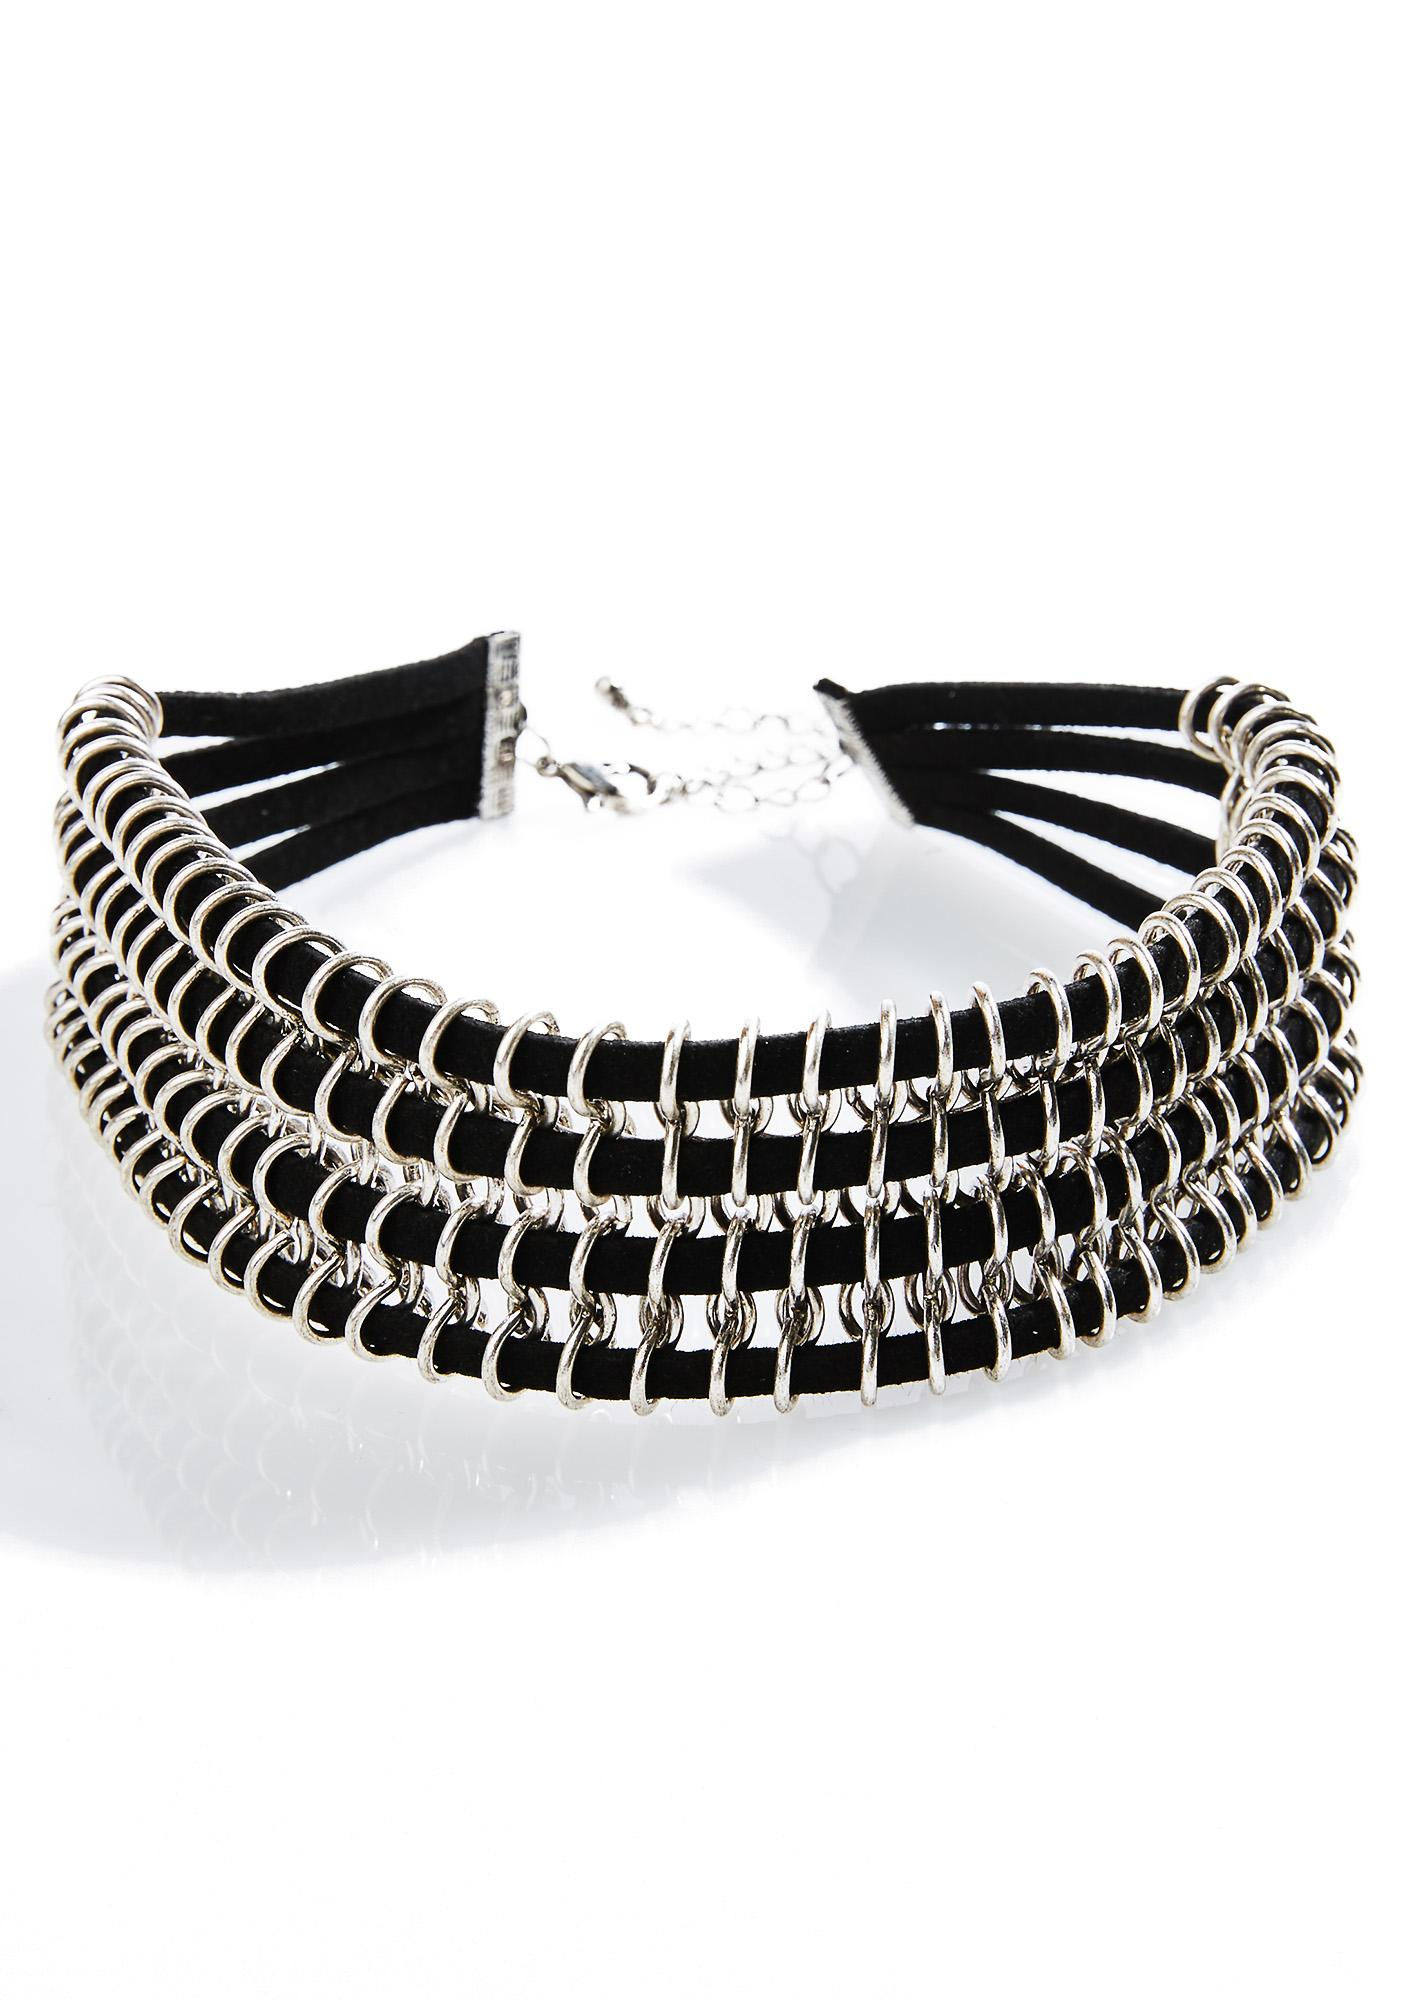 Lunar Collar Necklace